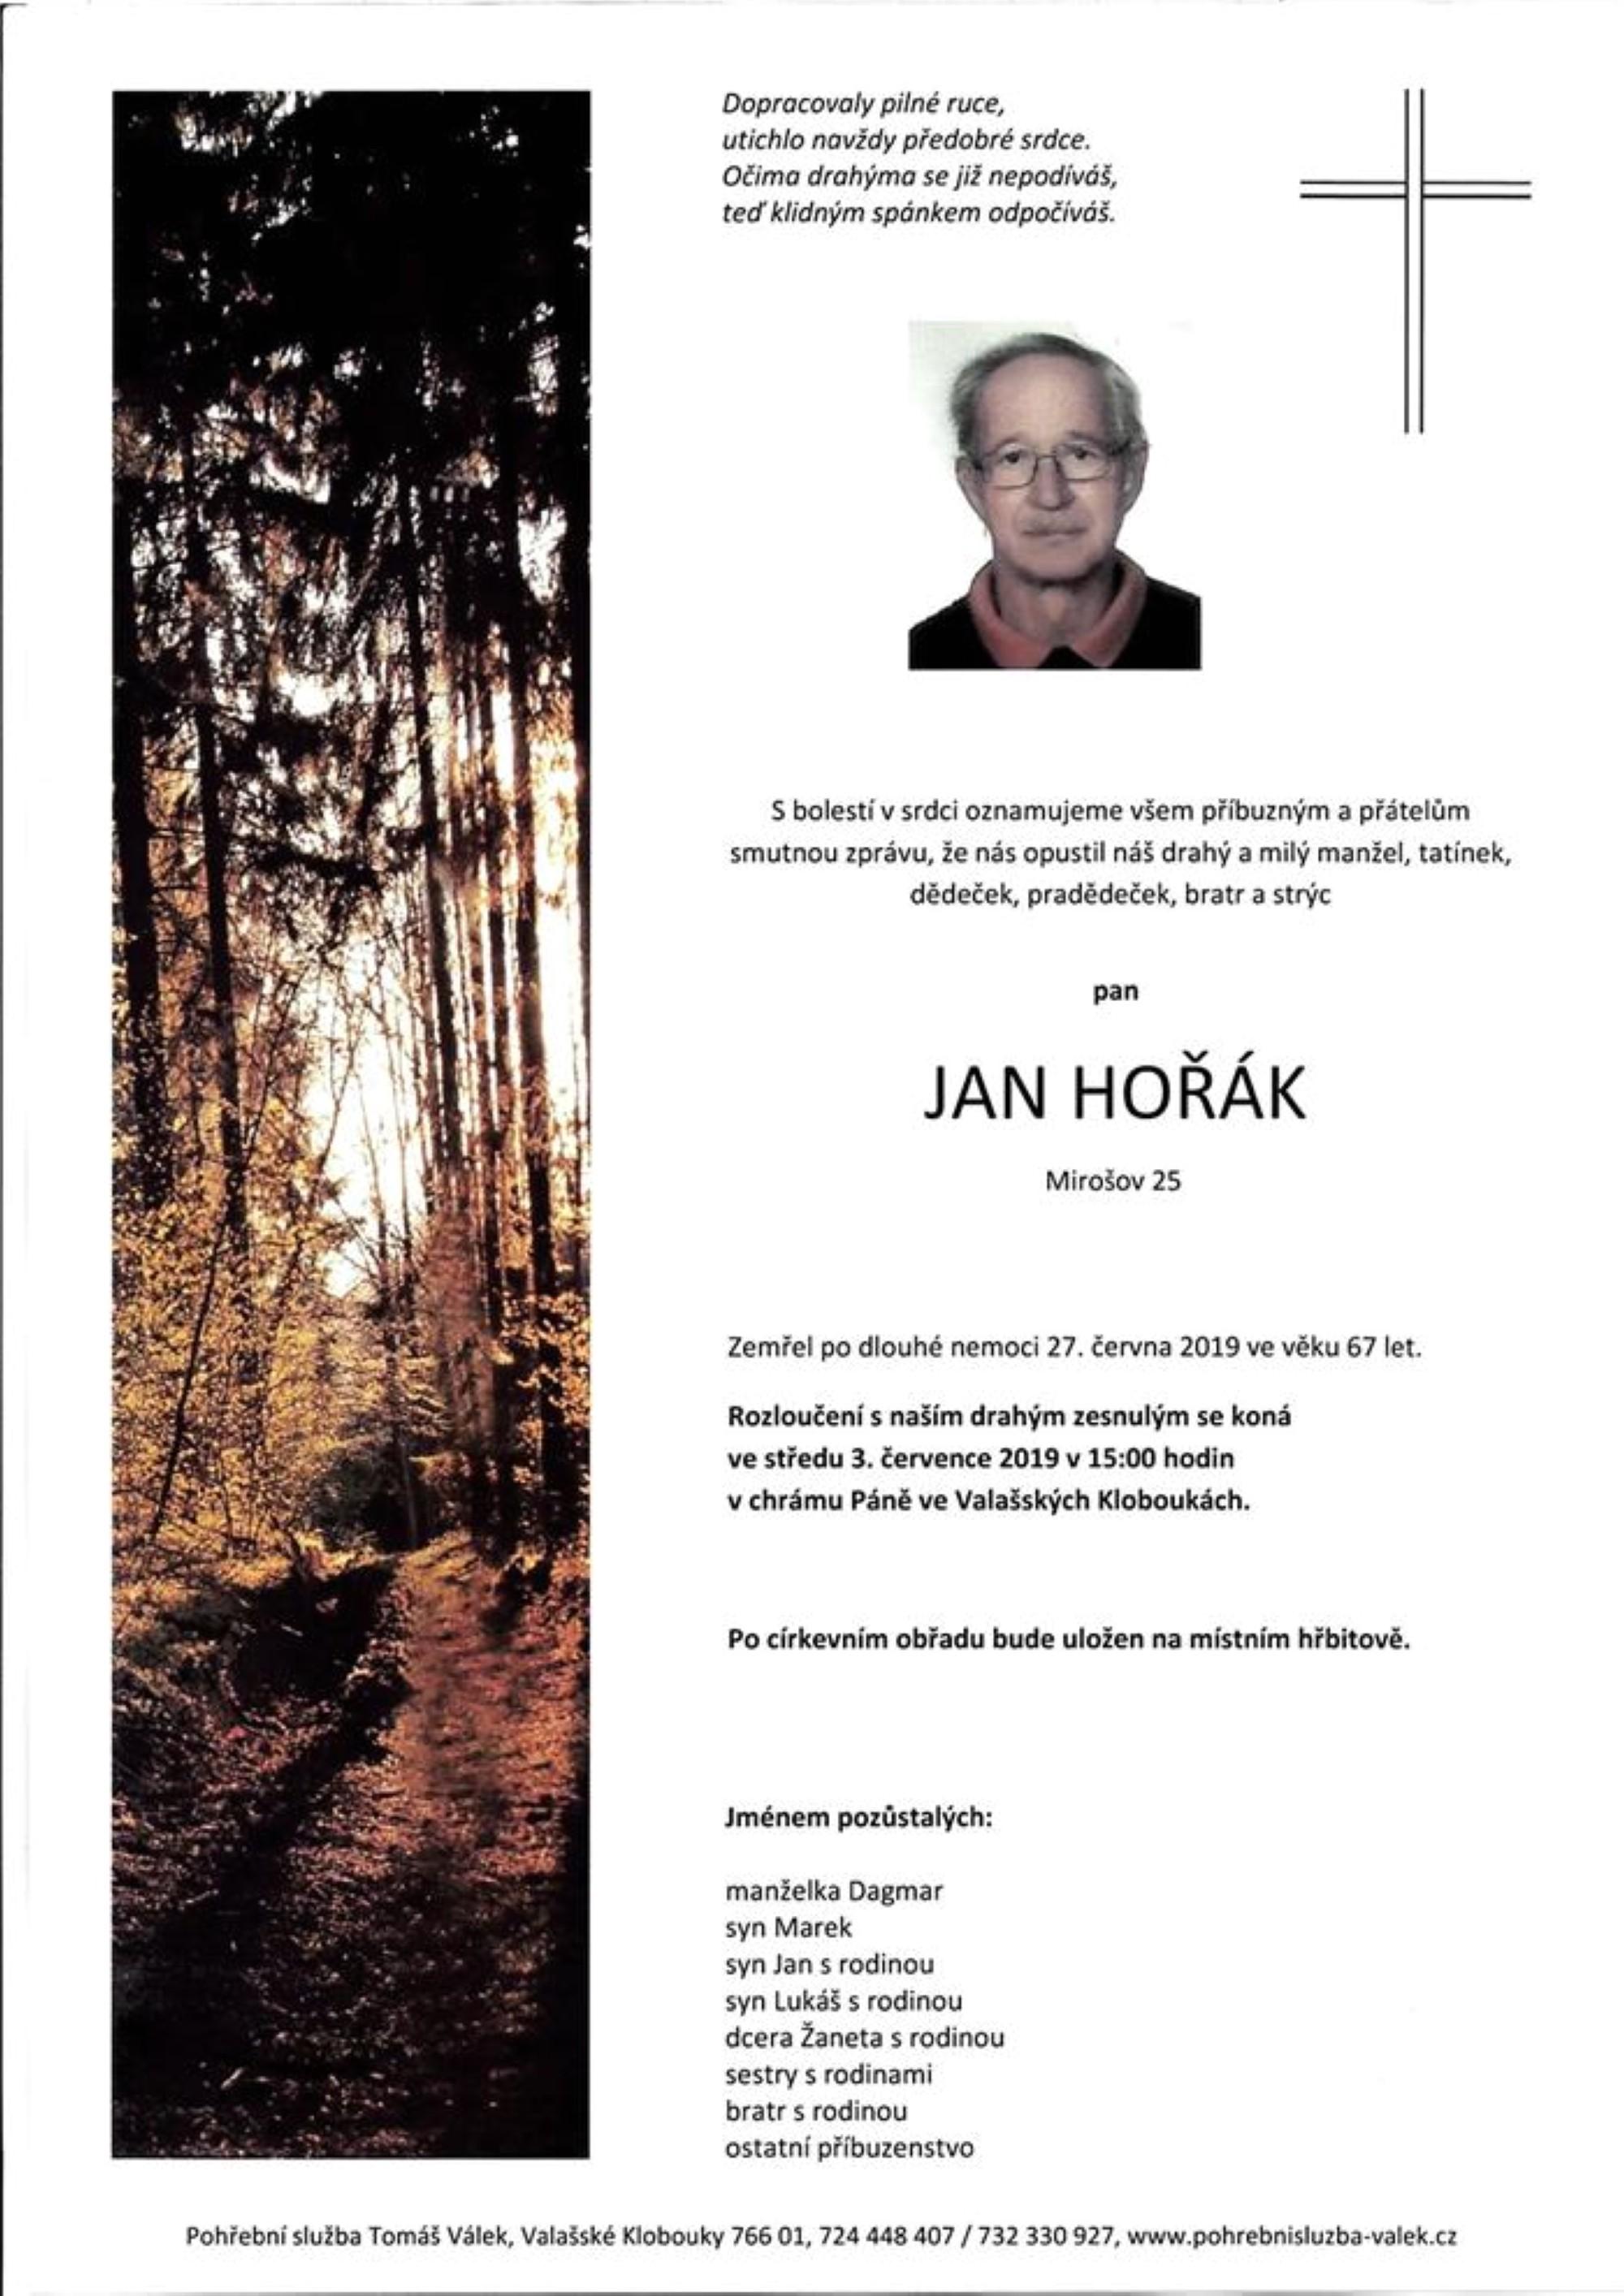 Jan Hořák